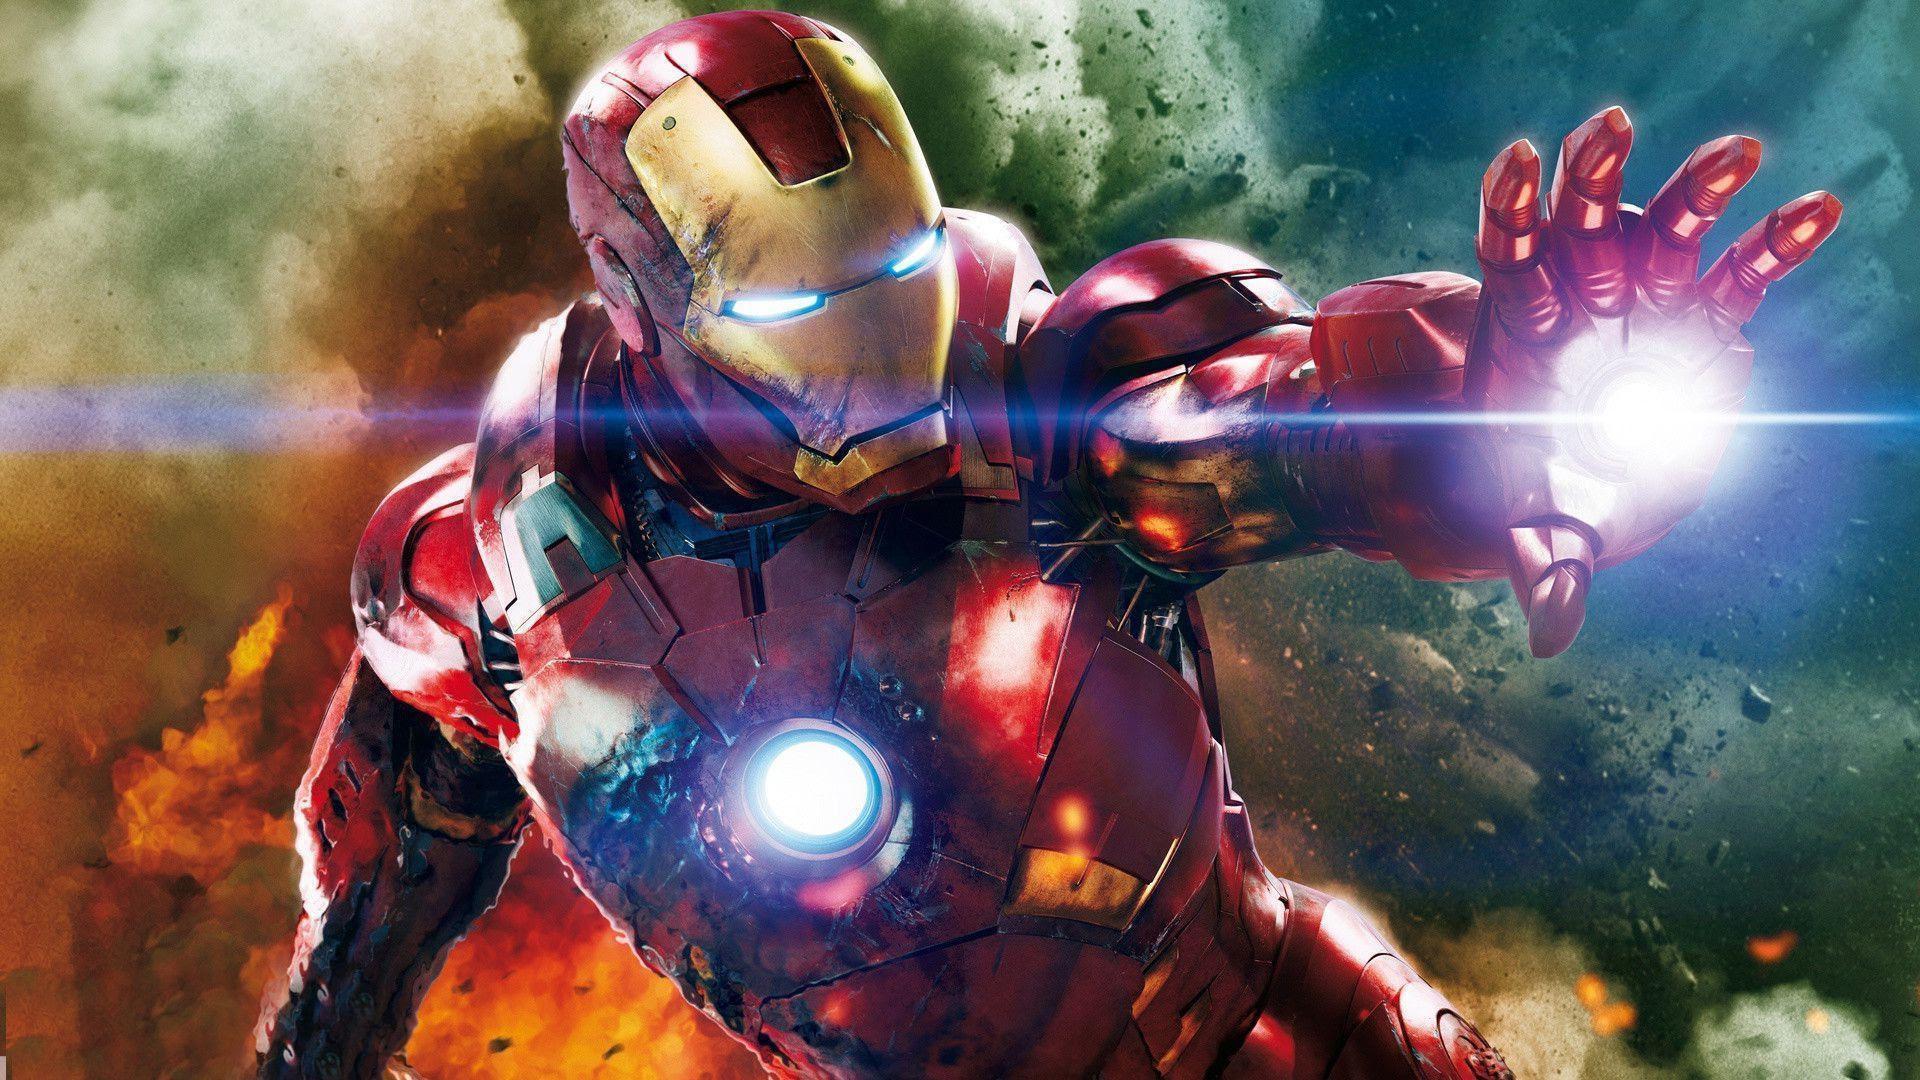 HD Wallpapers Iron Man 3  Wallpaper Cave